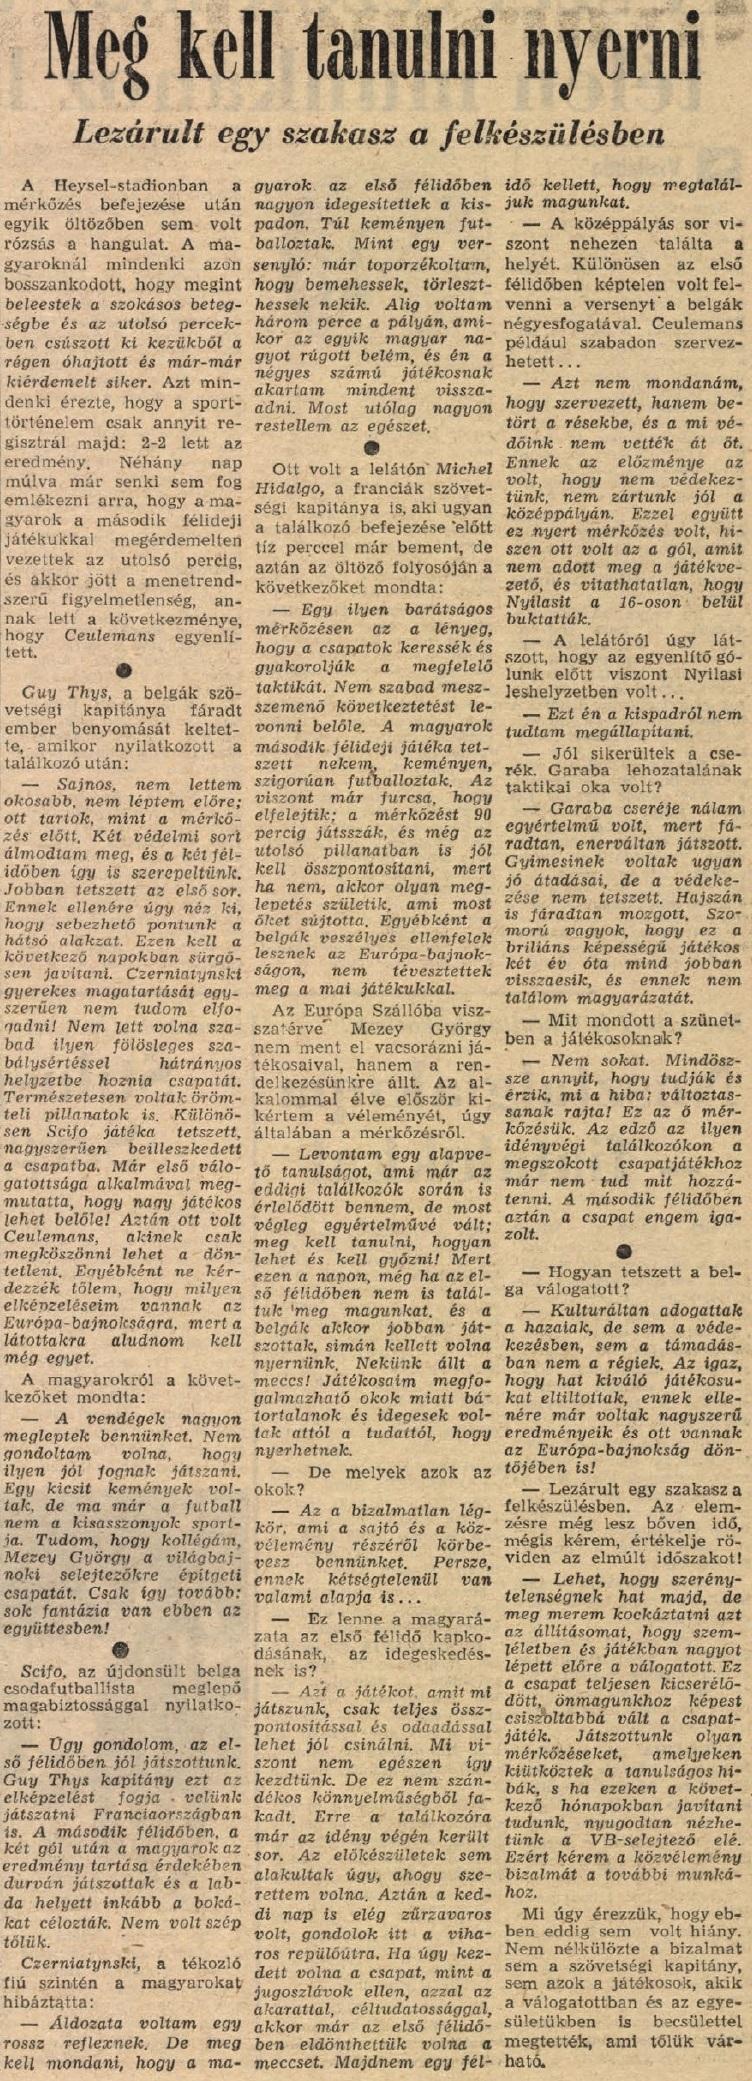 idokapszula_nb_i_1983_84_belgium_magyarorszag_merkozes_2.jpg